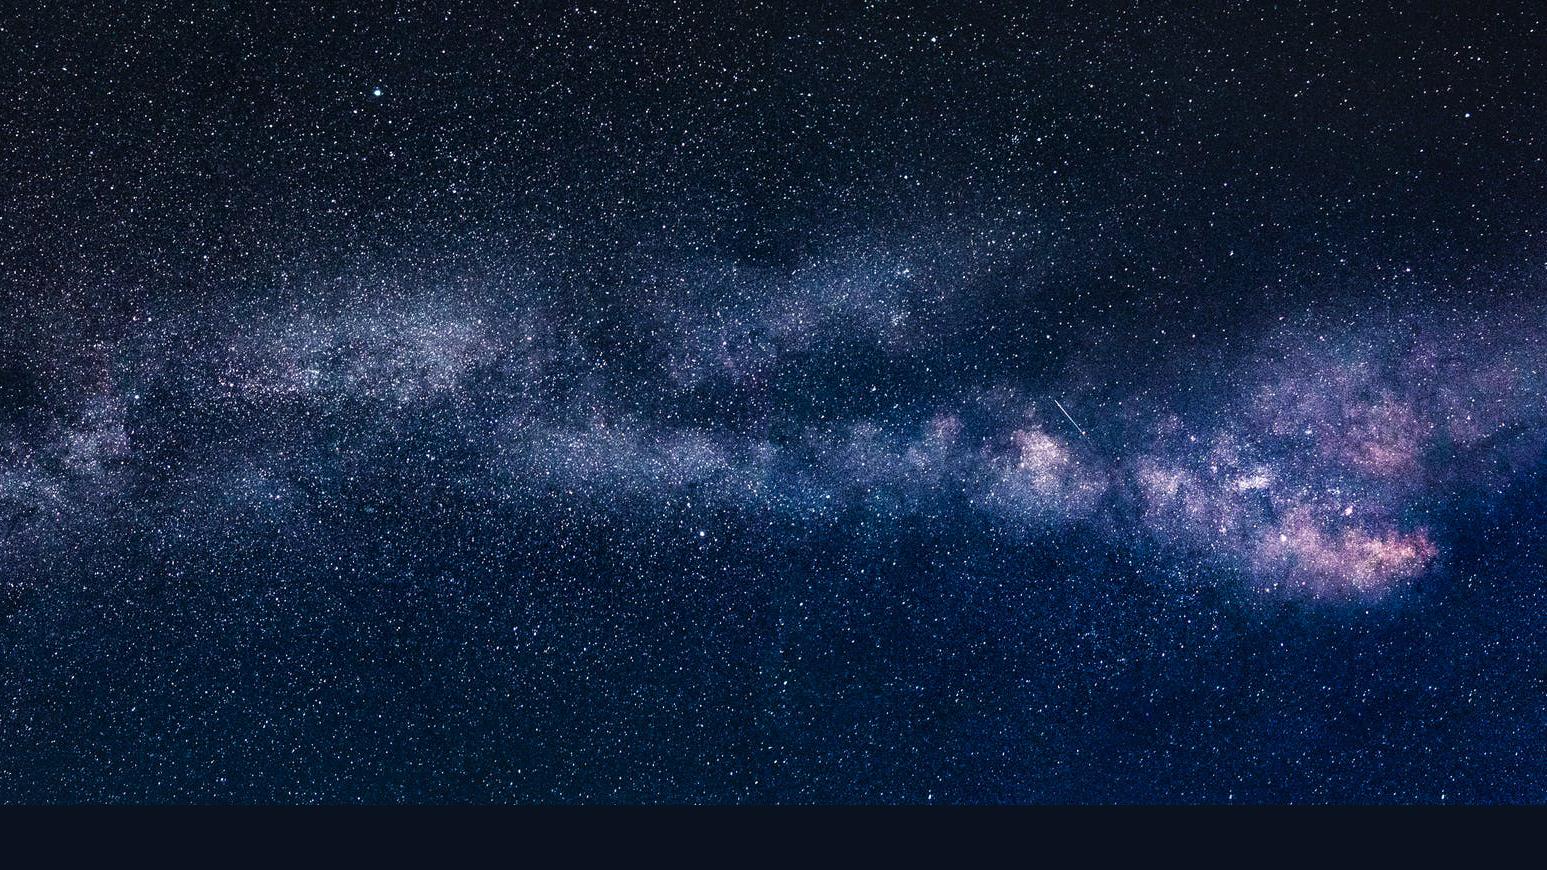 stock image of night sky via Pexels